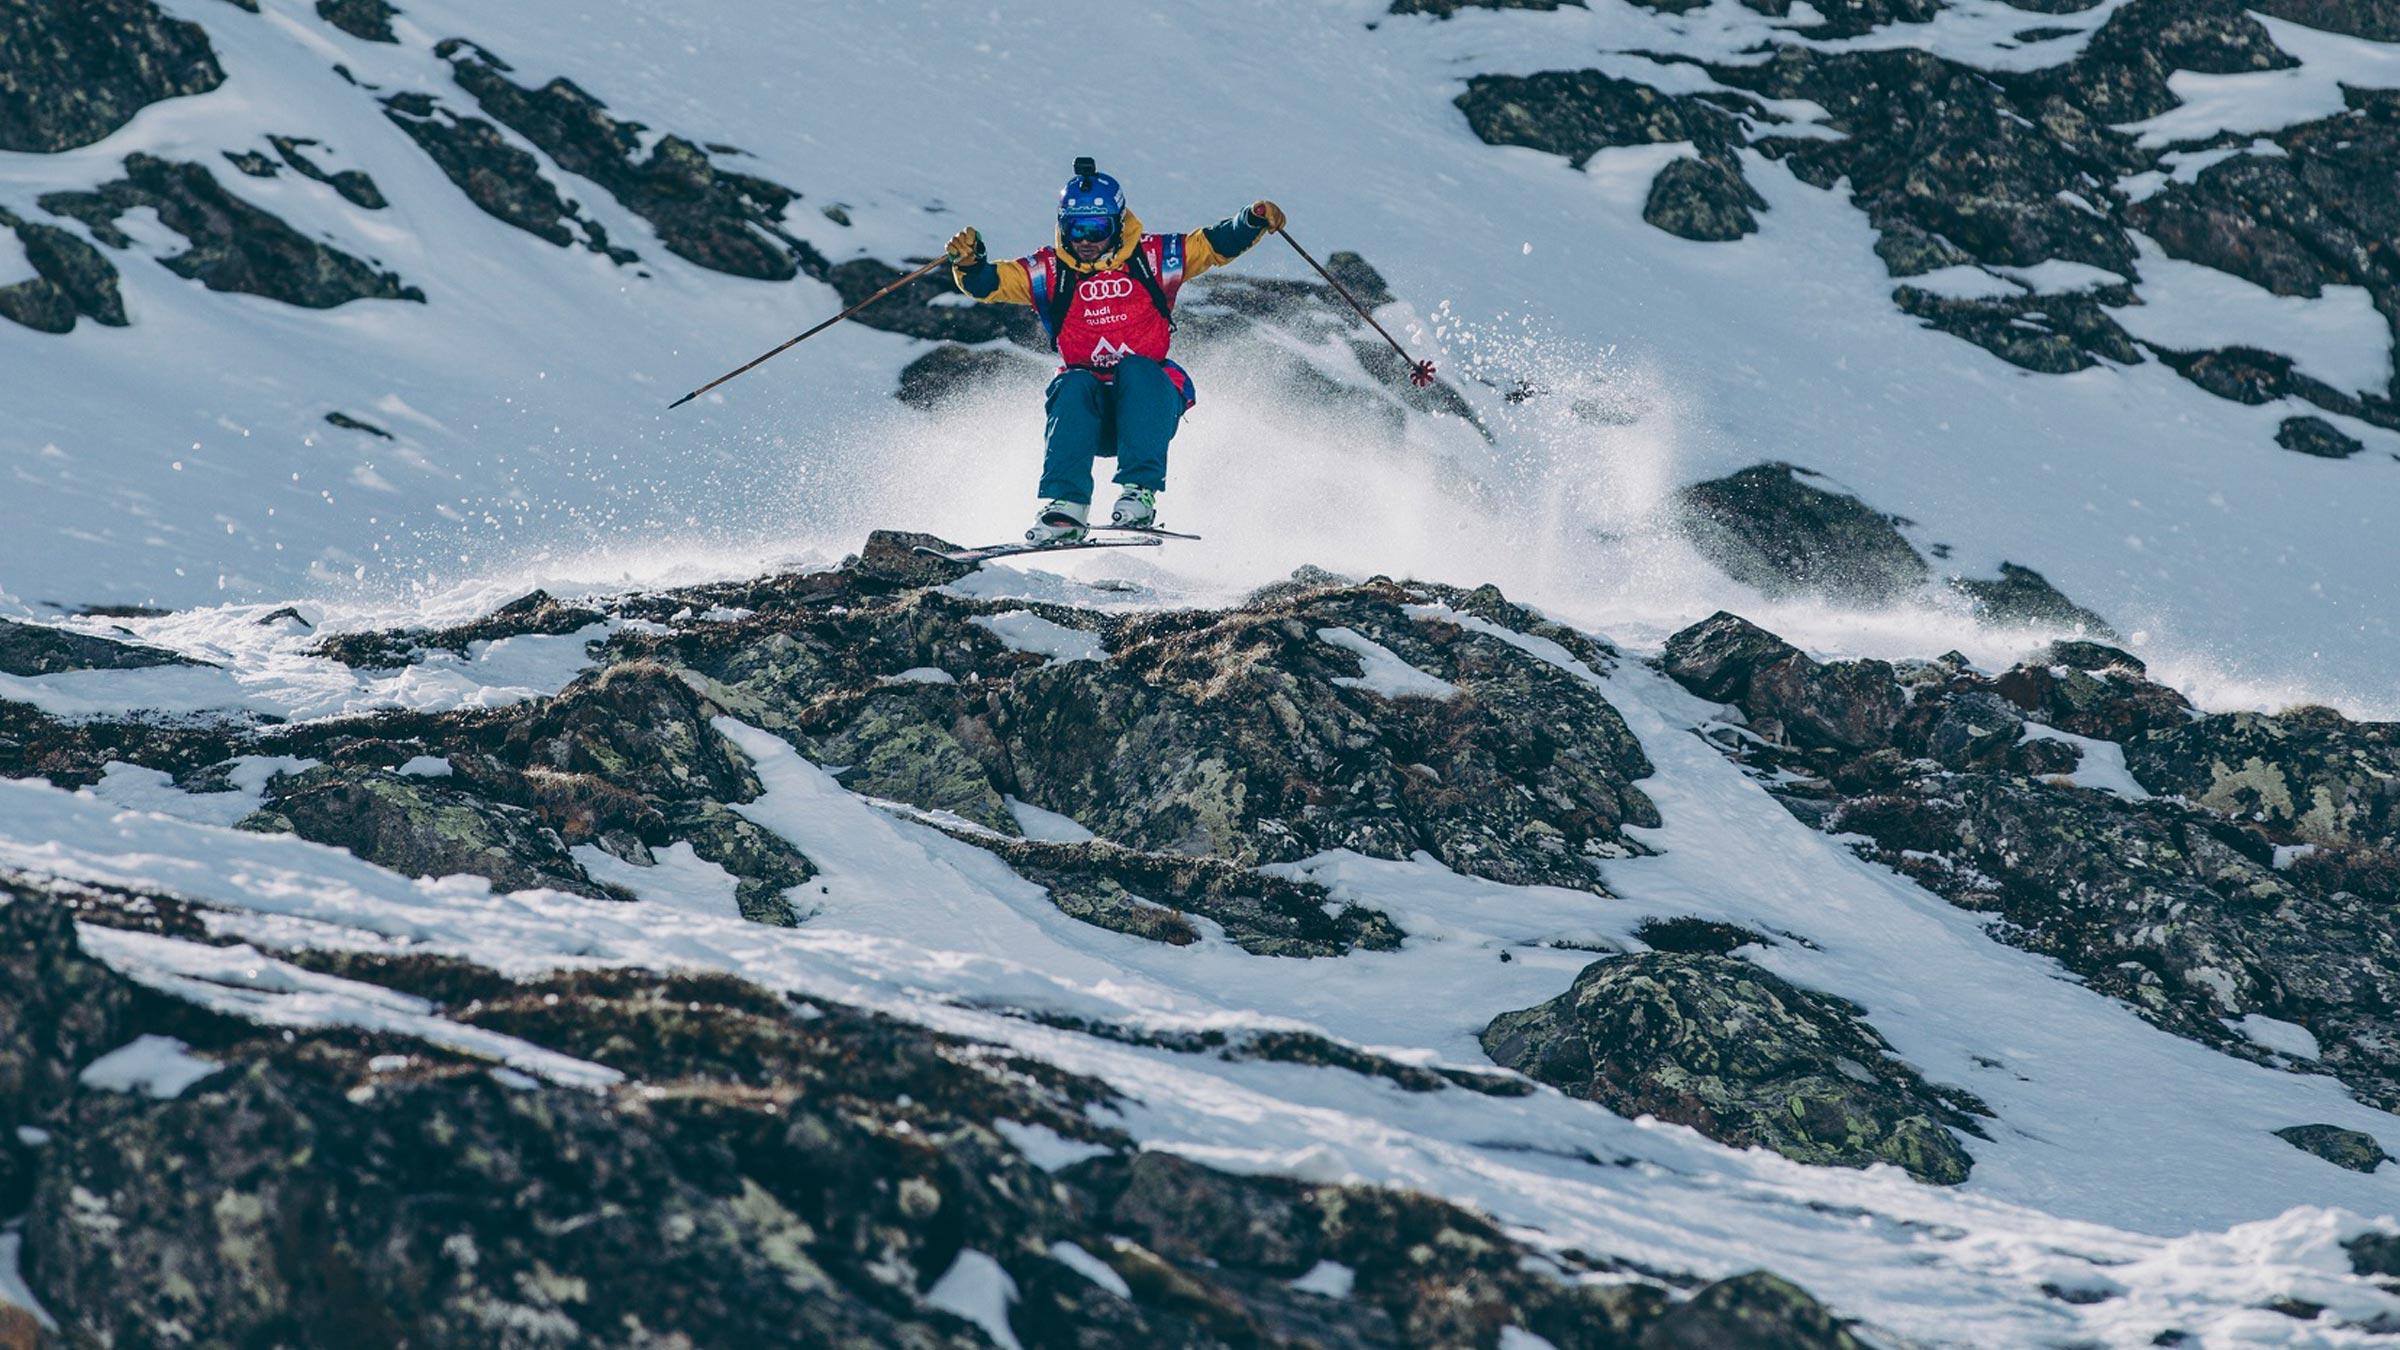 Skifahrer im felsigen Gelände - Open Faces Freeride Contest Obergurgl-Hochgurgl